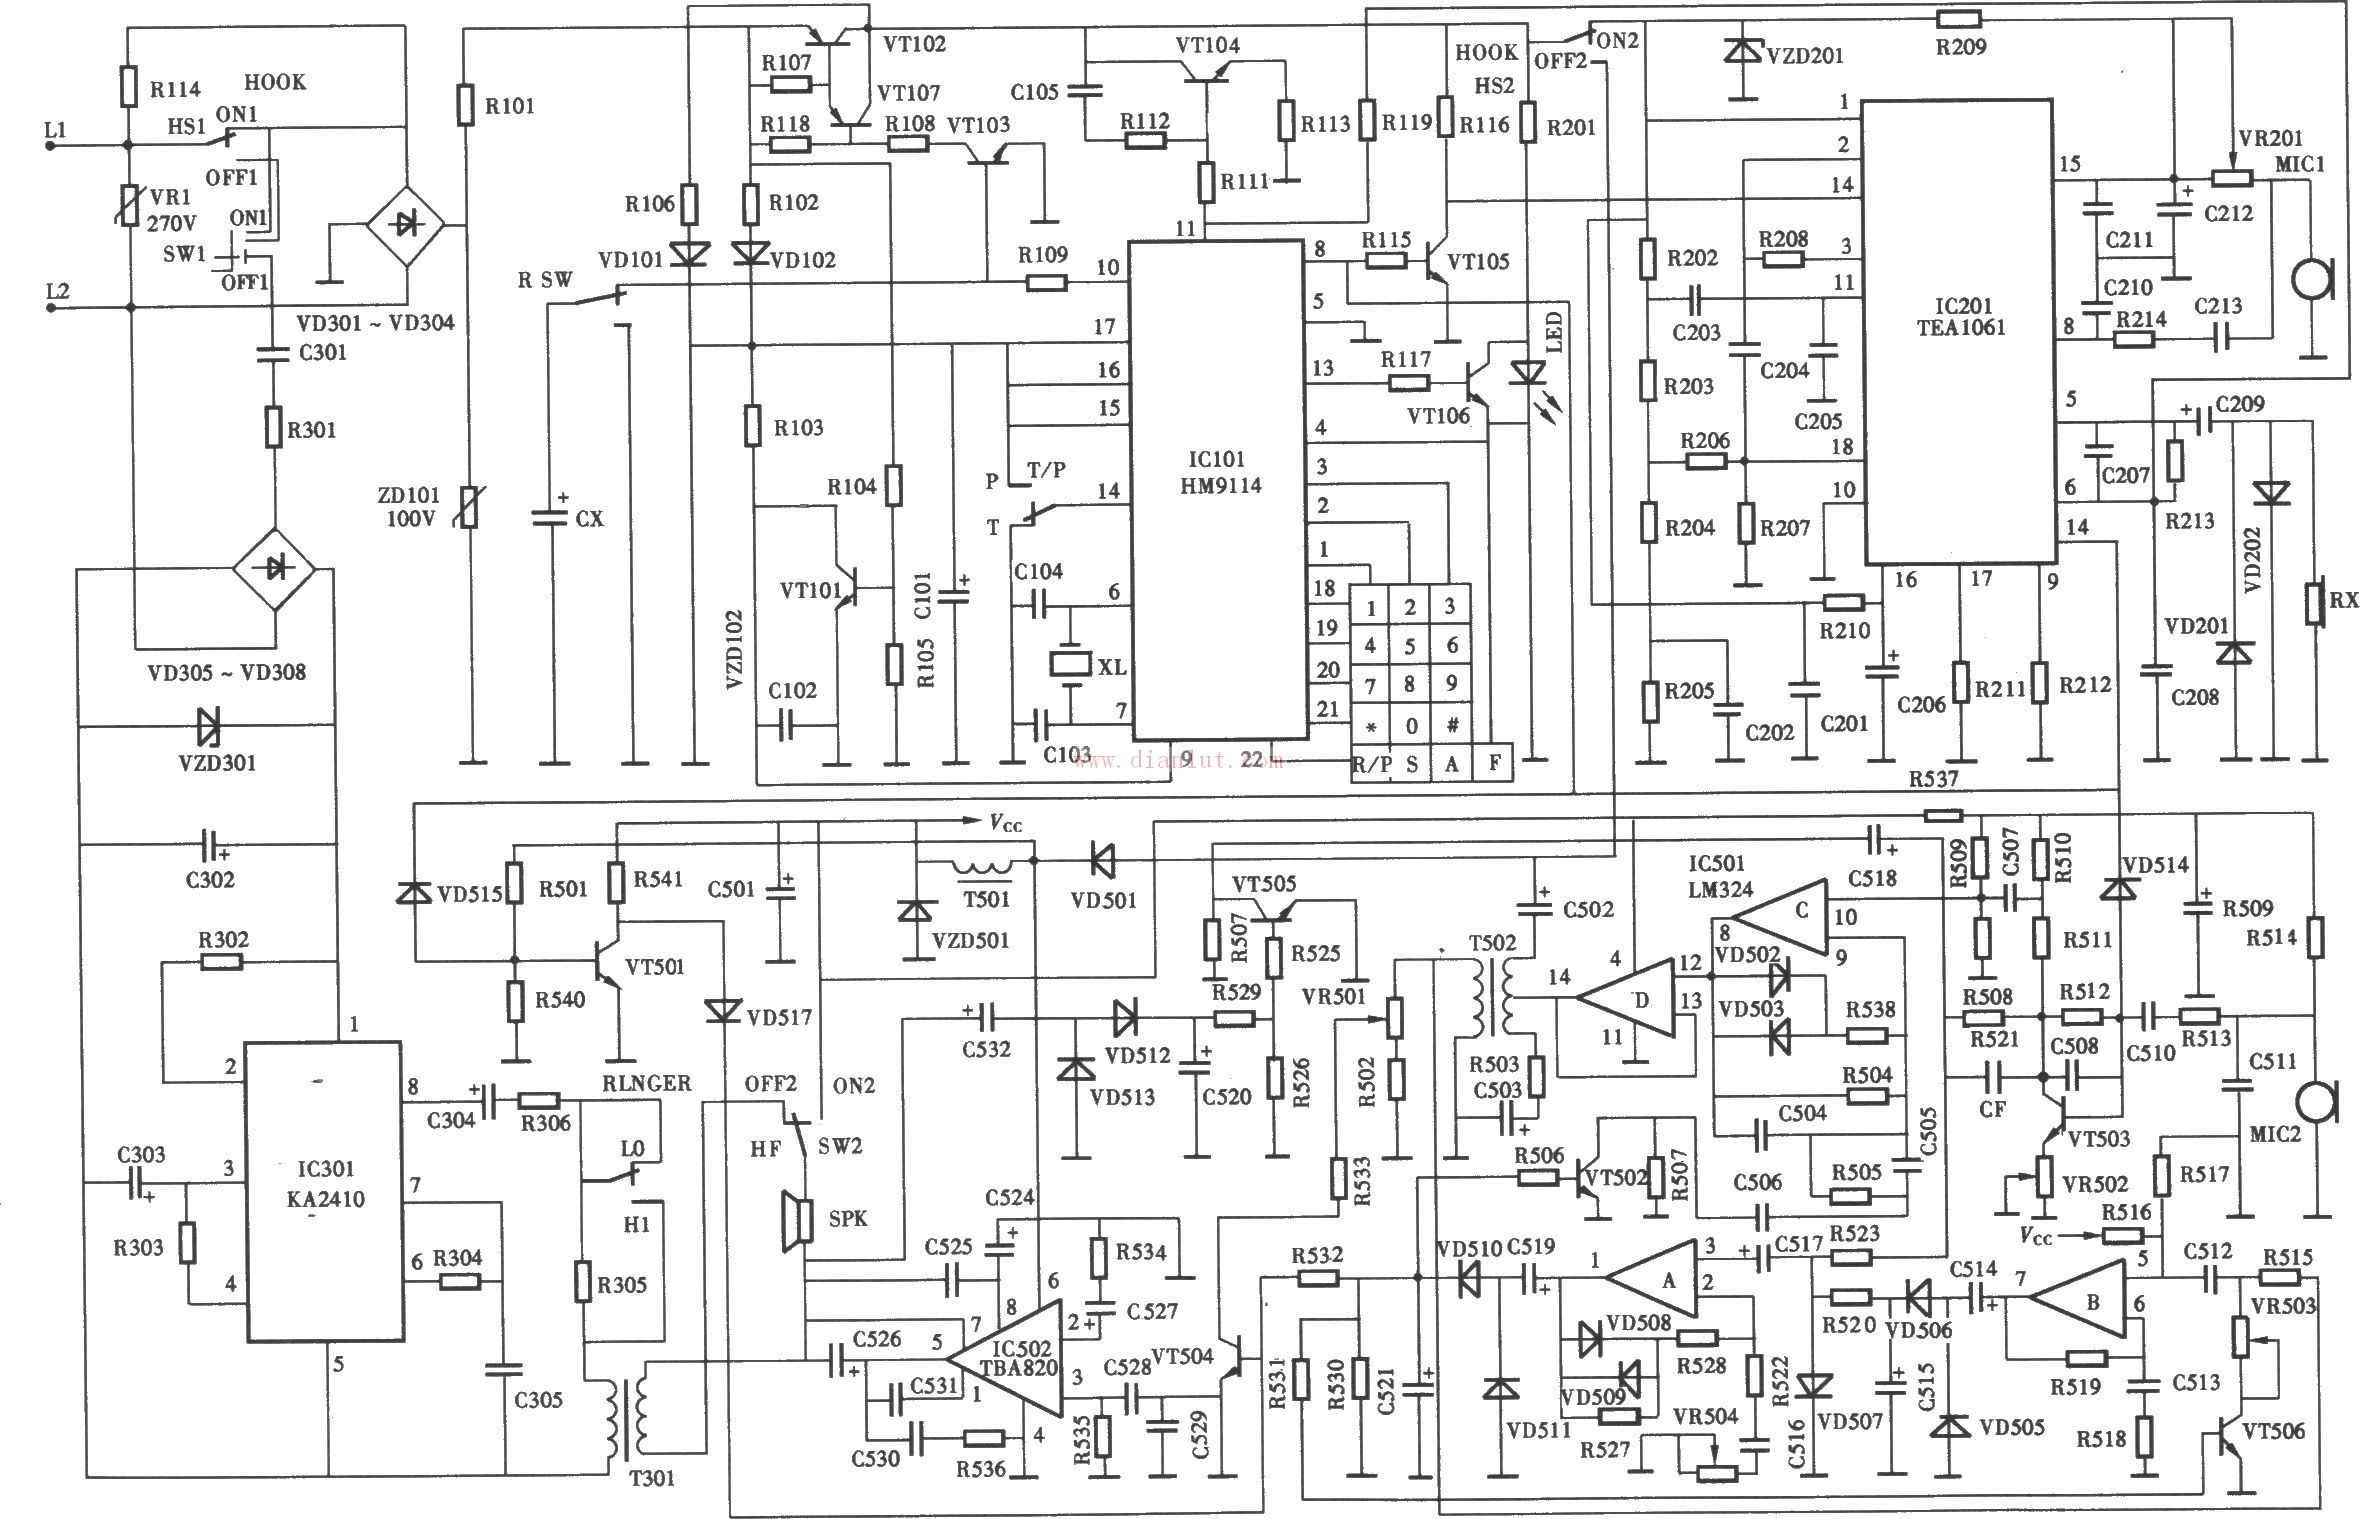 tcl电话机电路原理图